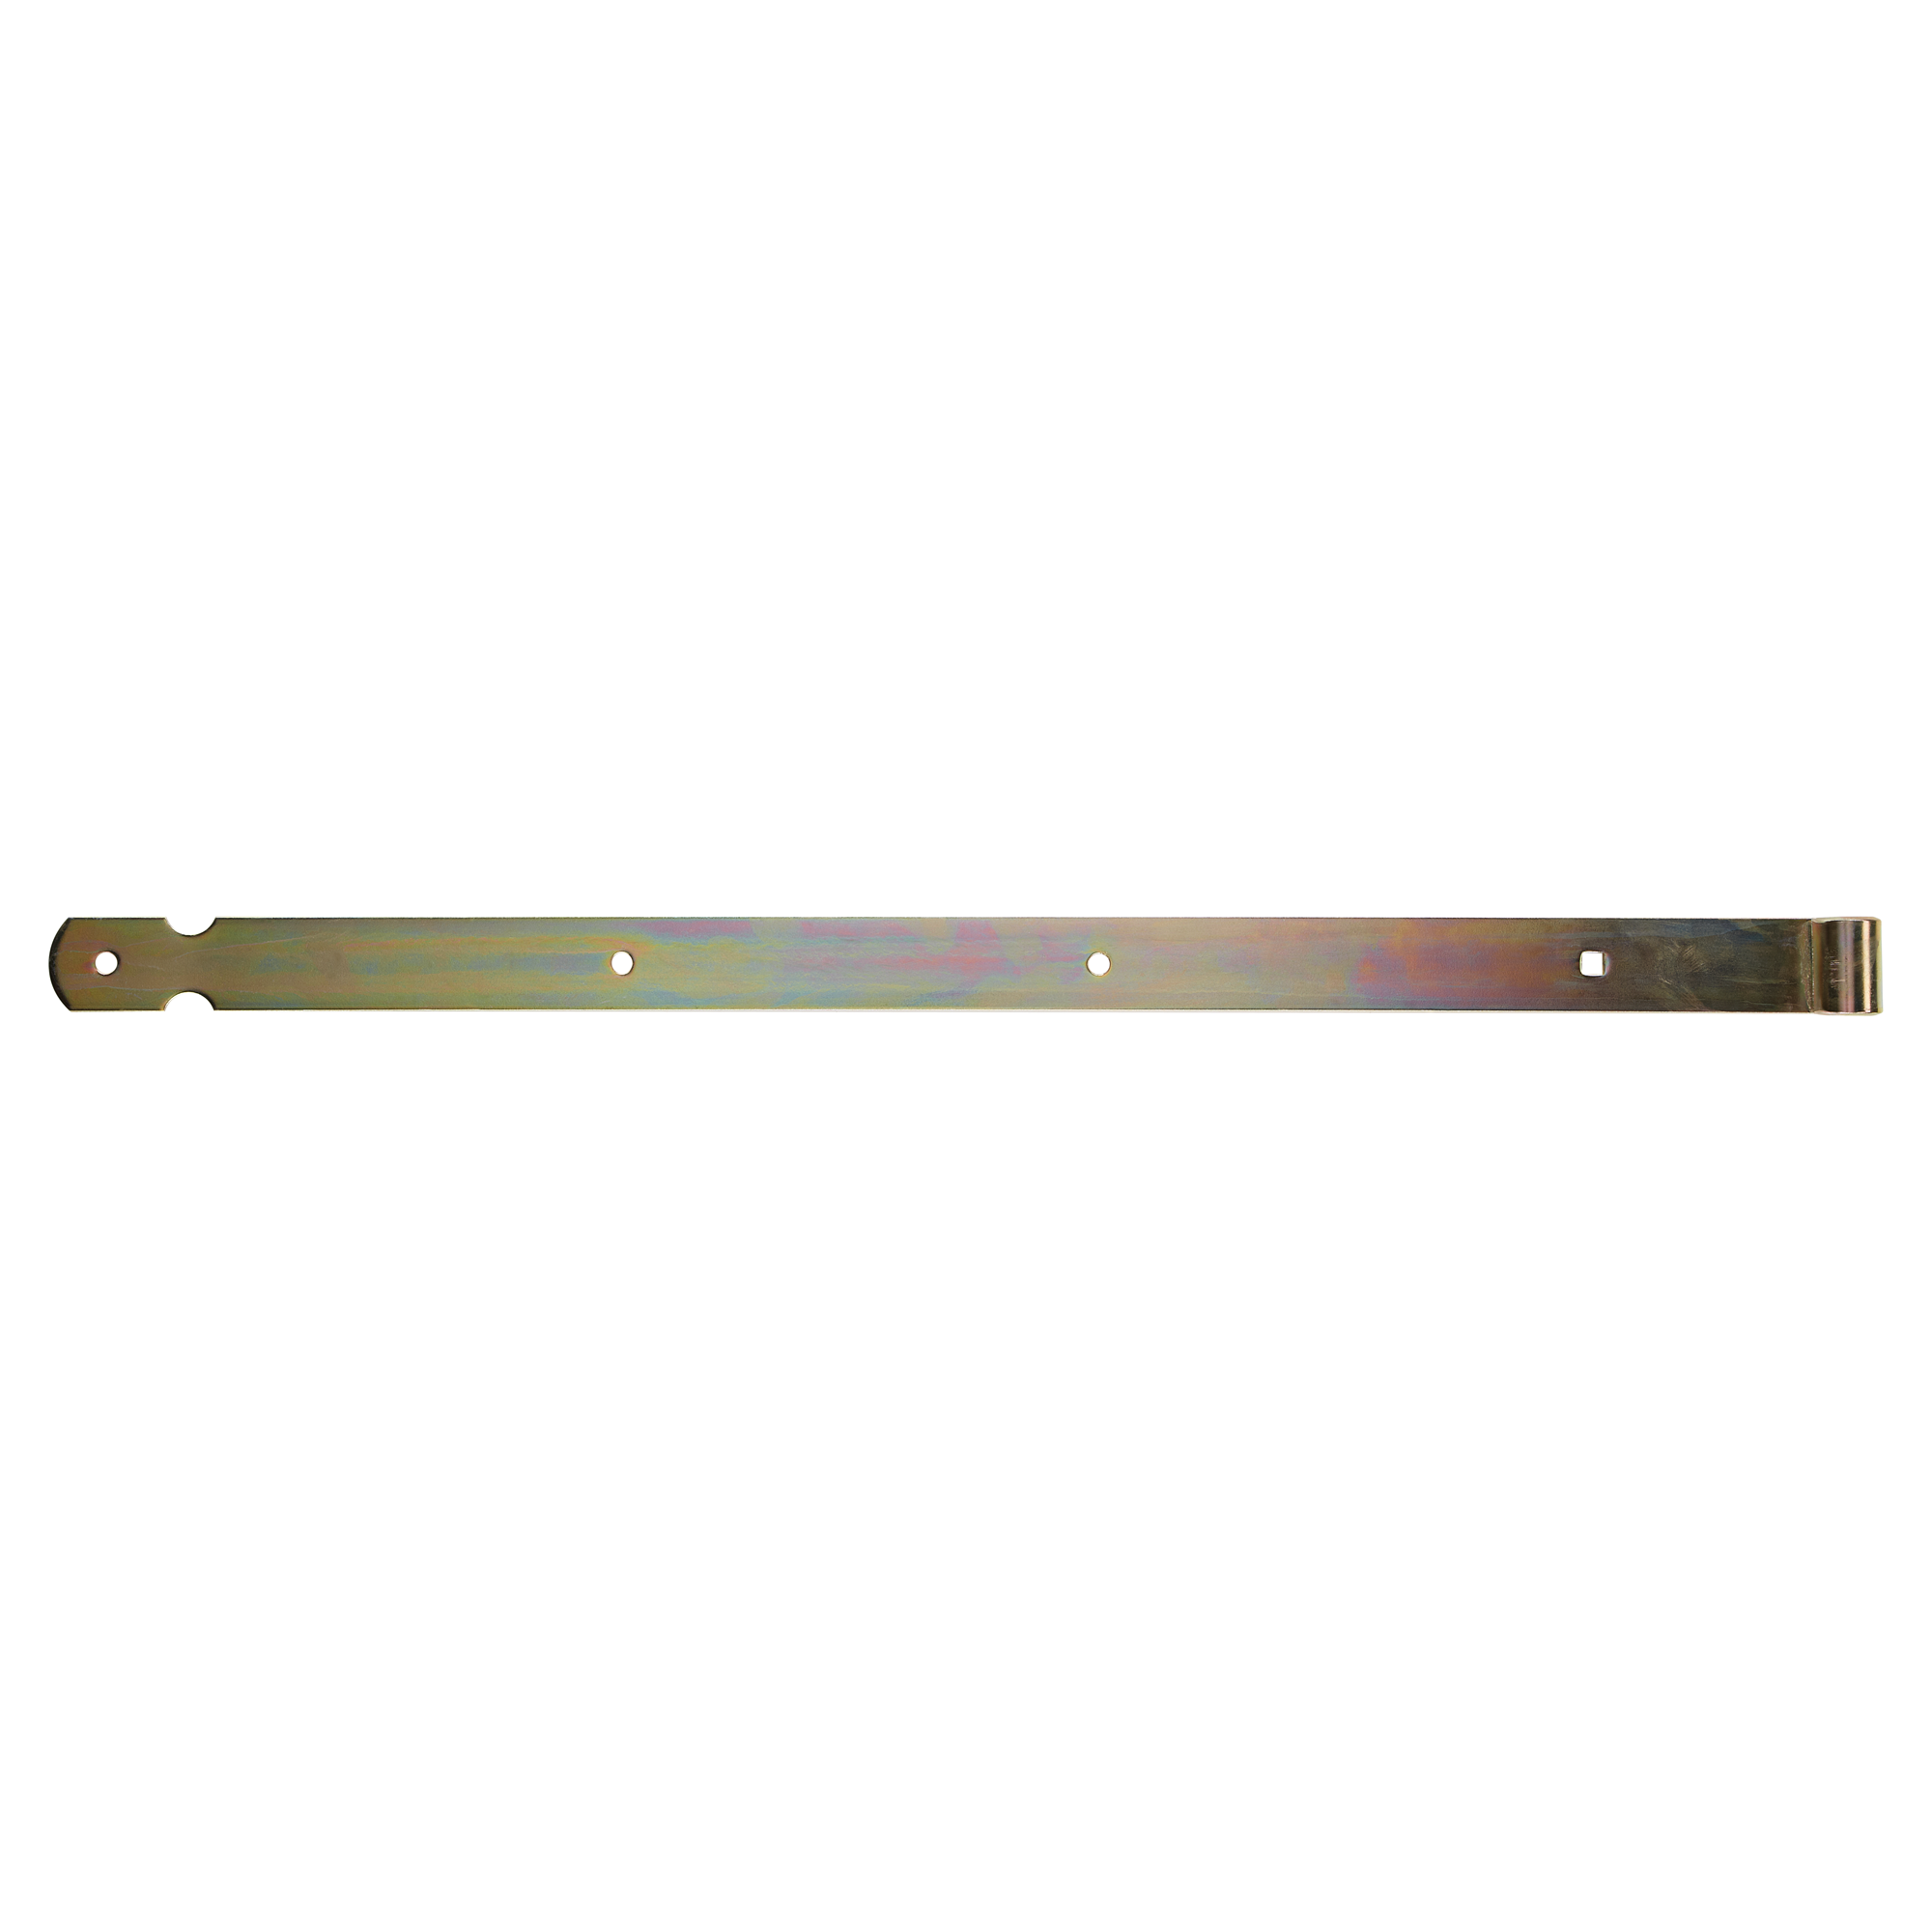 ladenband 70 cm verzinkt ǀ toom baumarkt